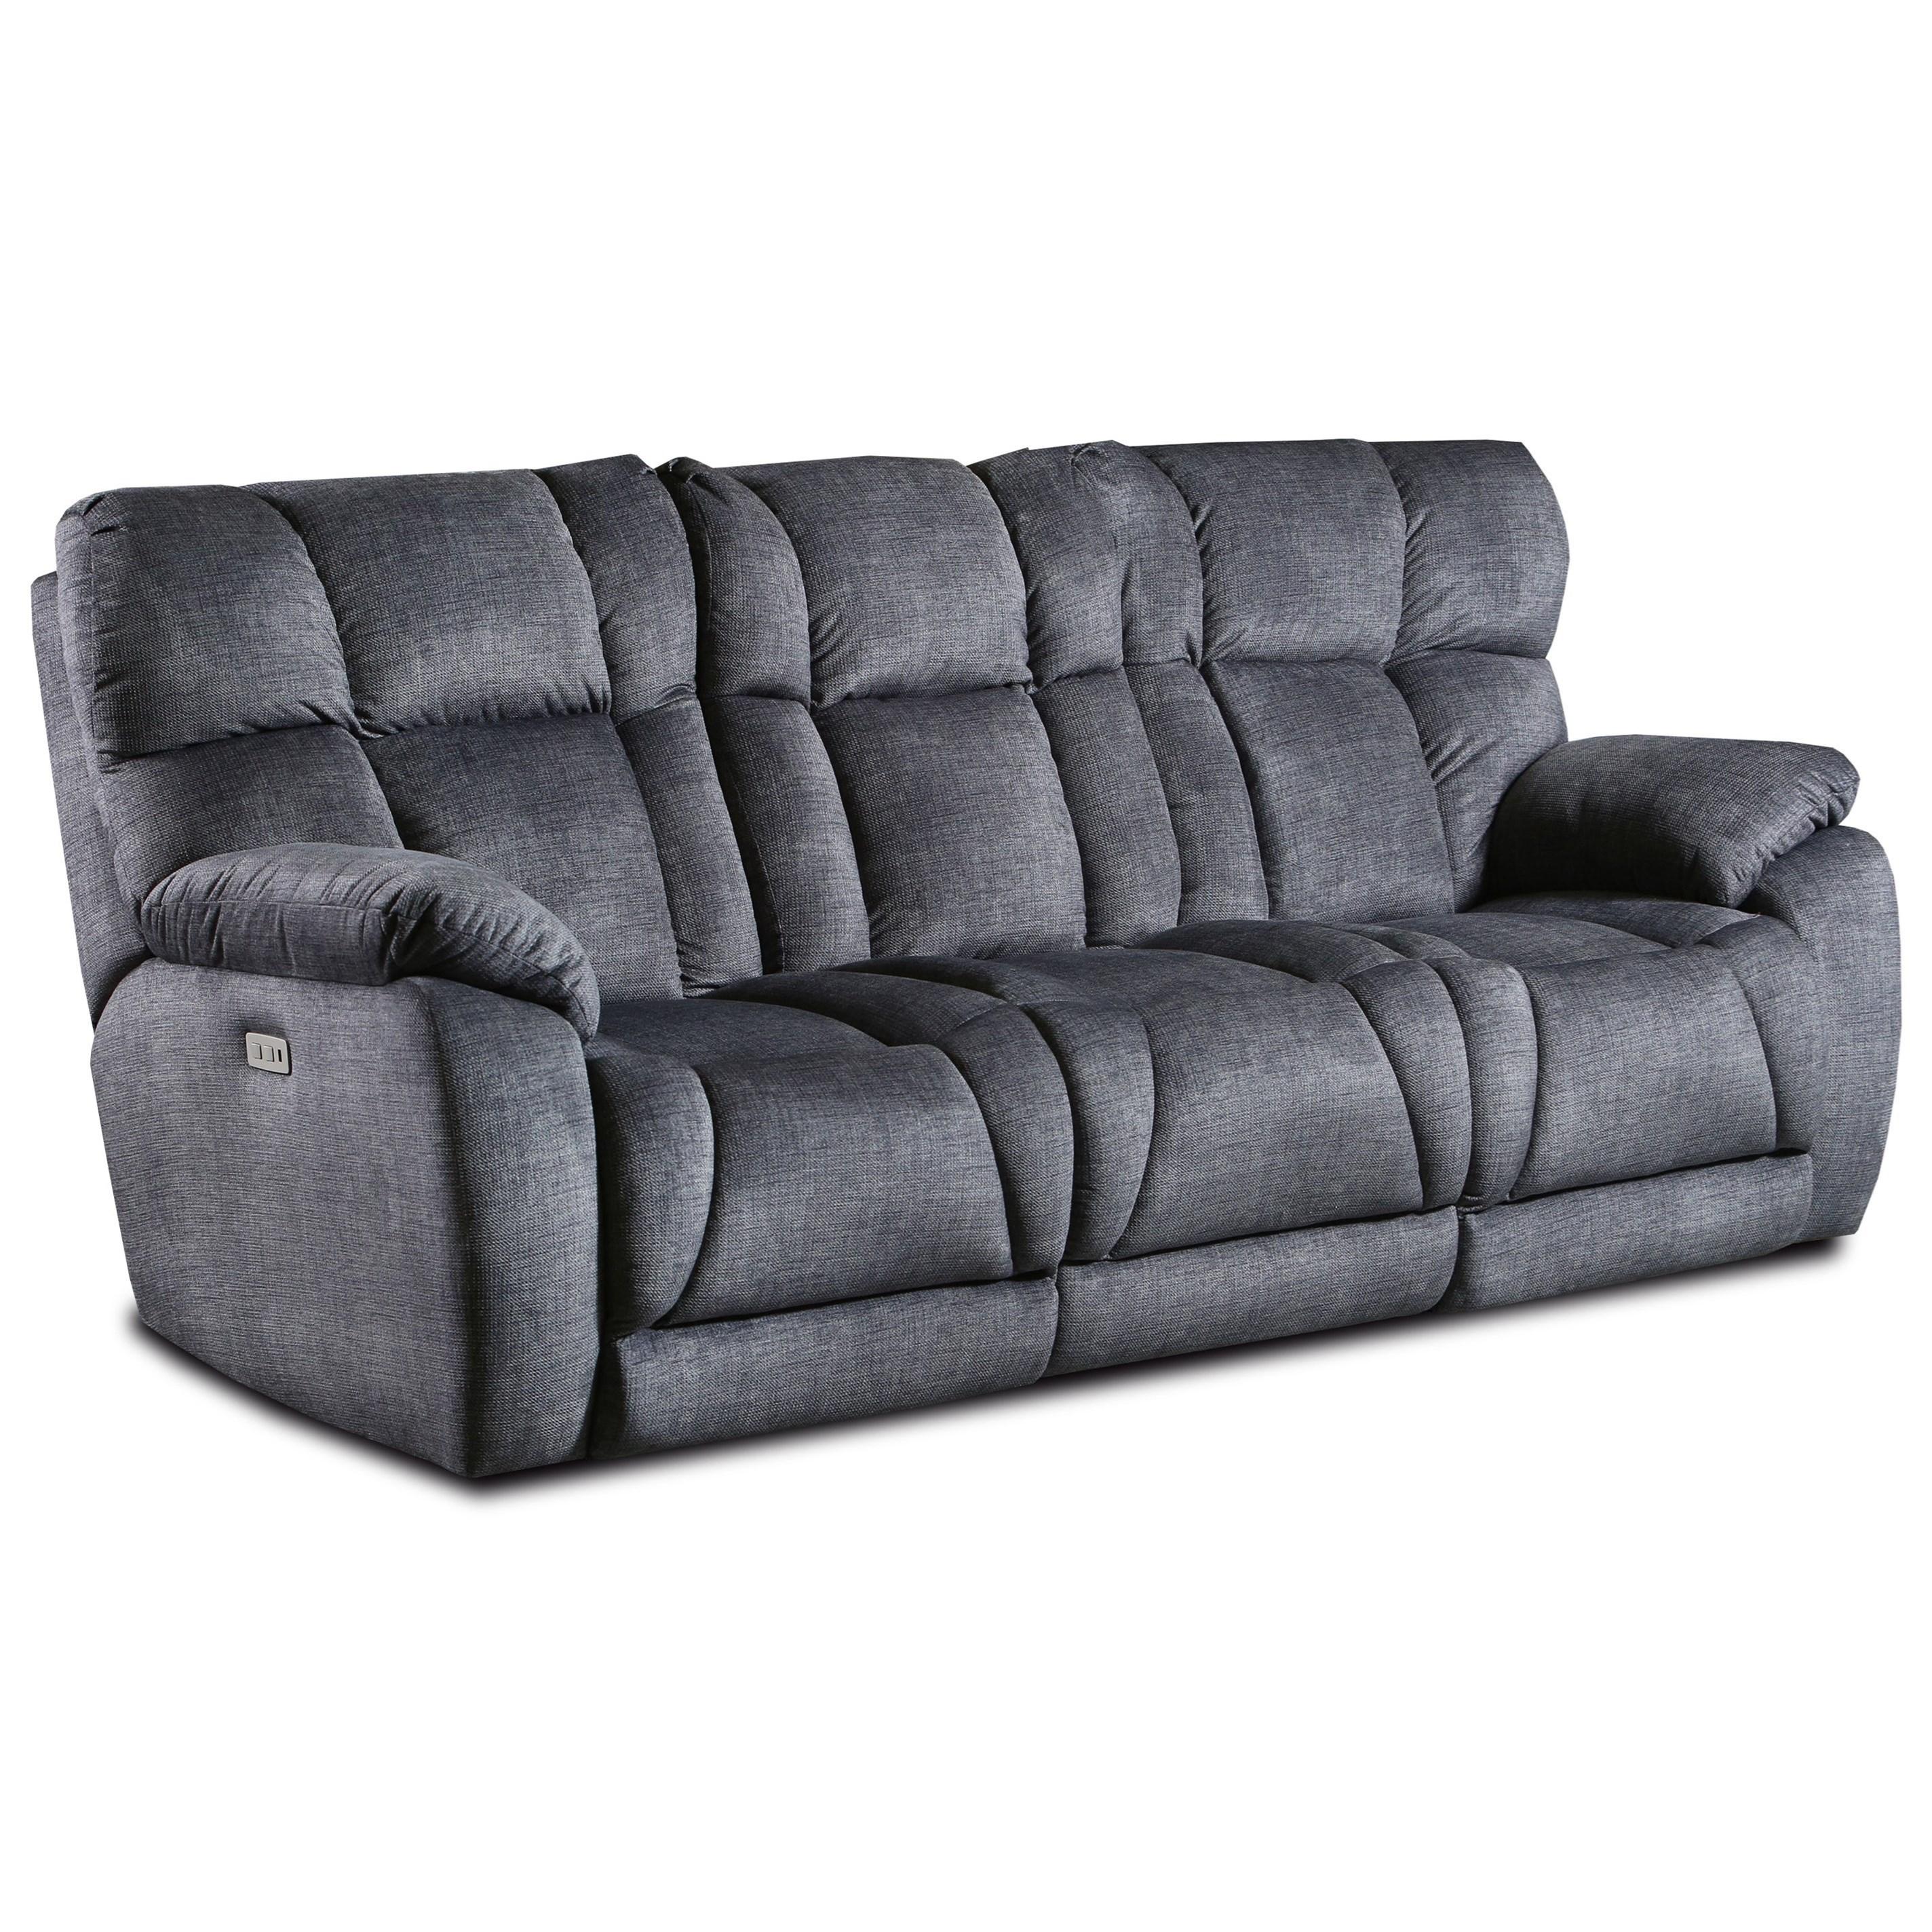 Casual Power Headrest Double Reclining Sofa w/ Dropdown Table